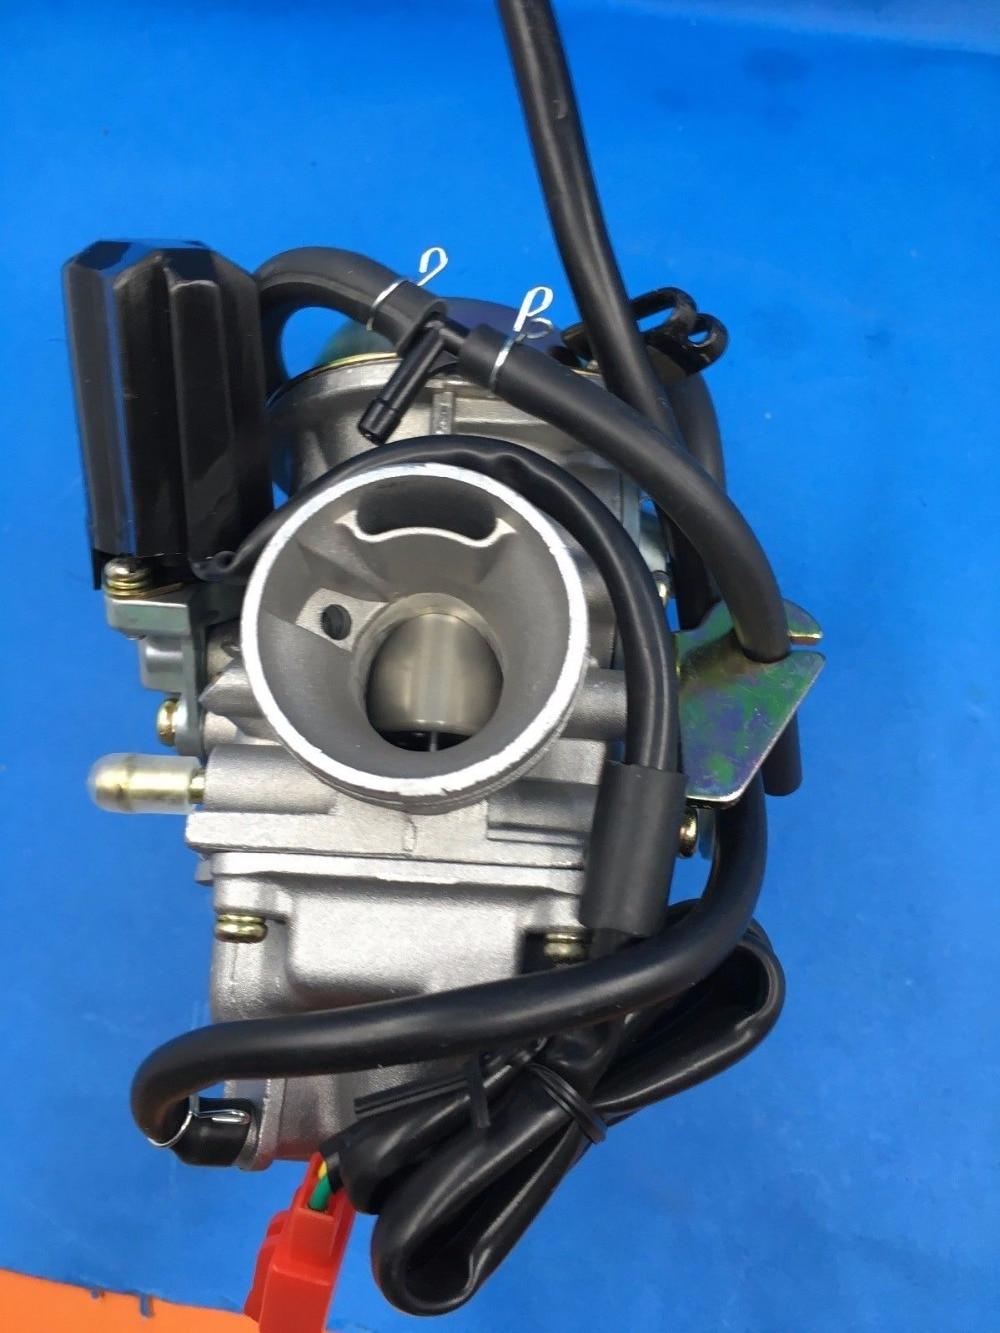 oem pd24j carburetor carb electric choke 125cc 150cc scooter atv gy6 4 stroke qmj152 157 [ 1000 x 1333 Pixel ]